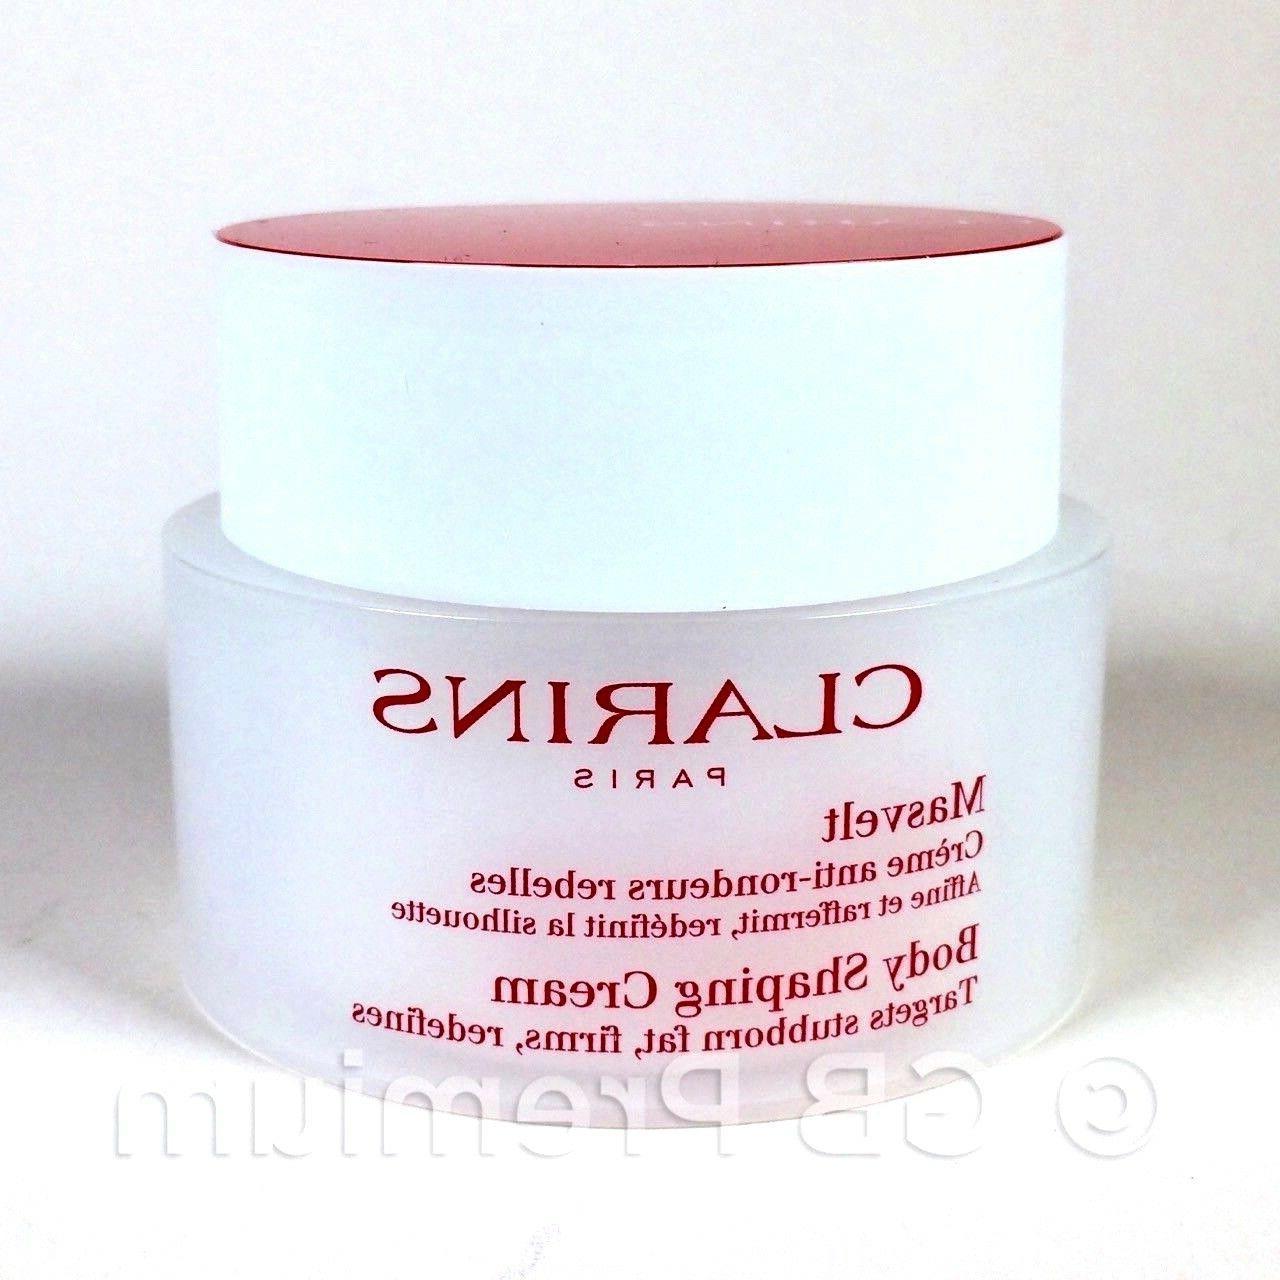 CLARINS Body Shaping Cream 6.4 oz/200ml NEW in Box, Sealed